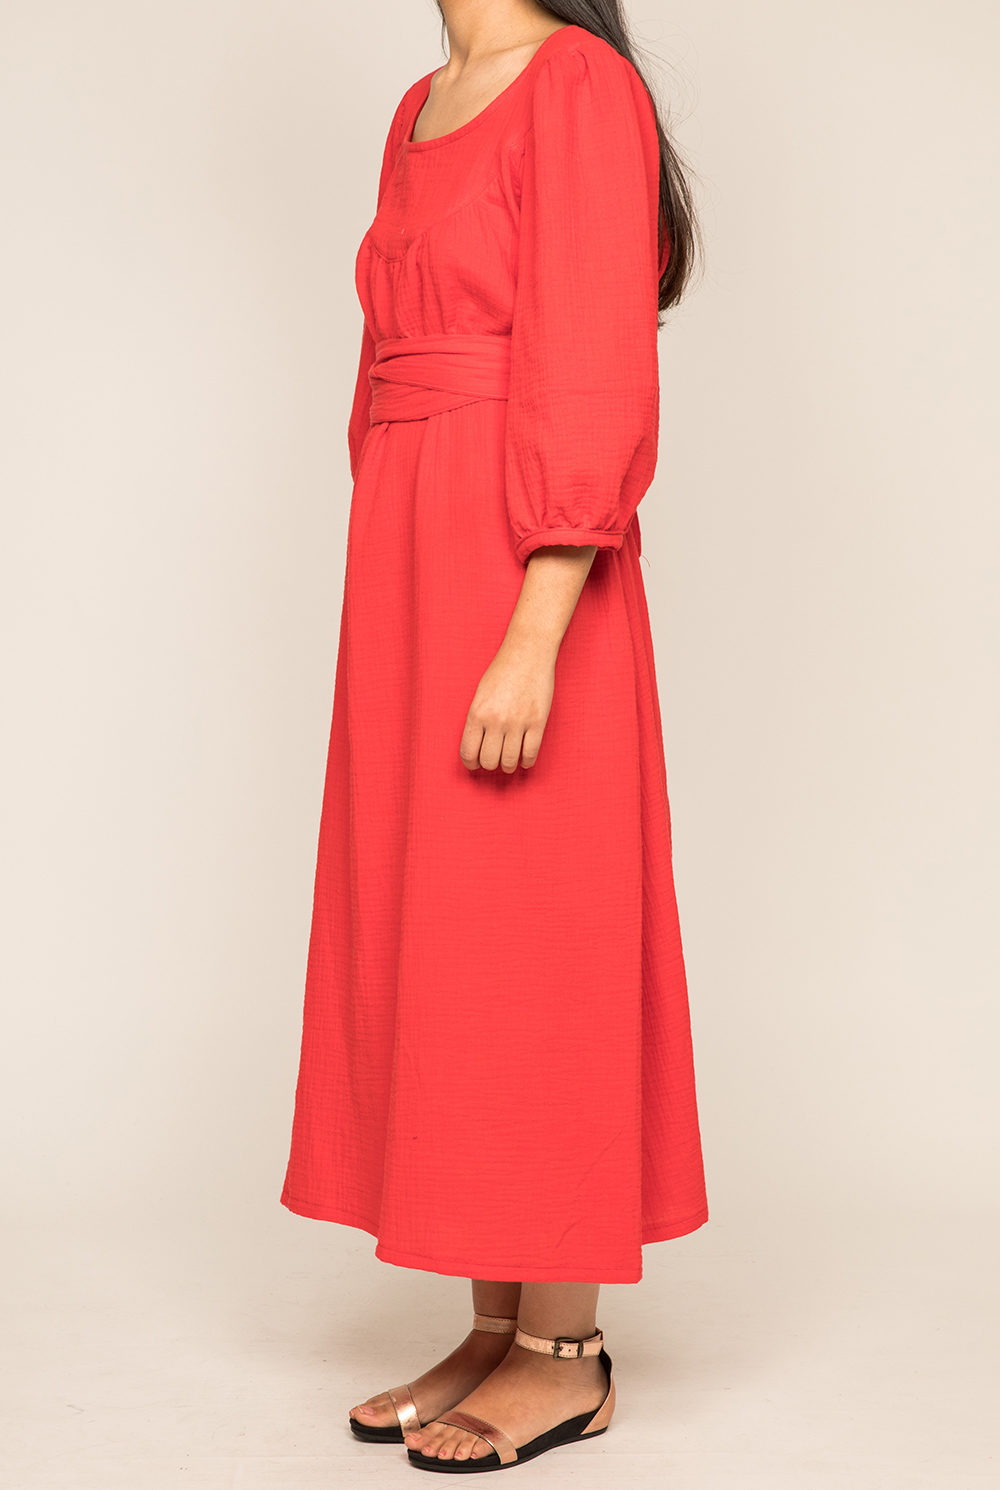 Robe Casablanca rouge